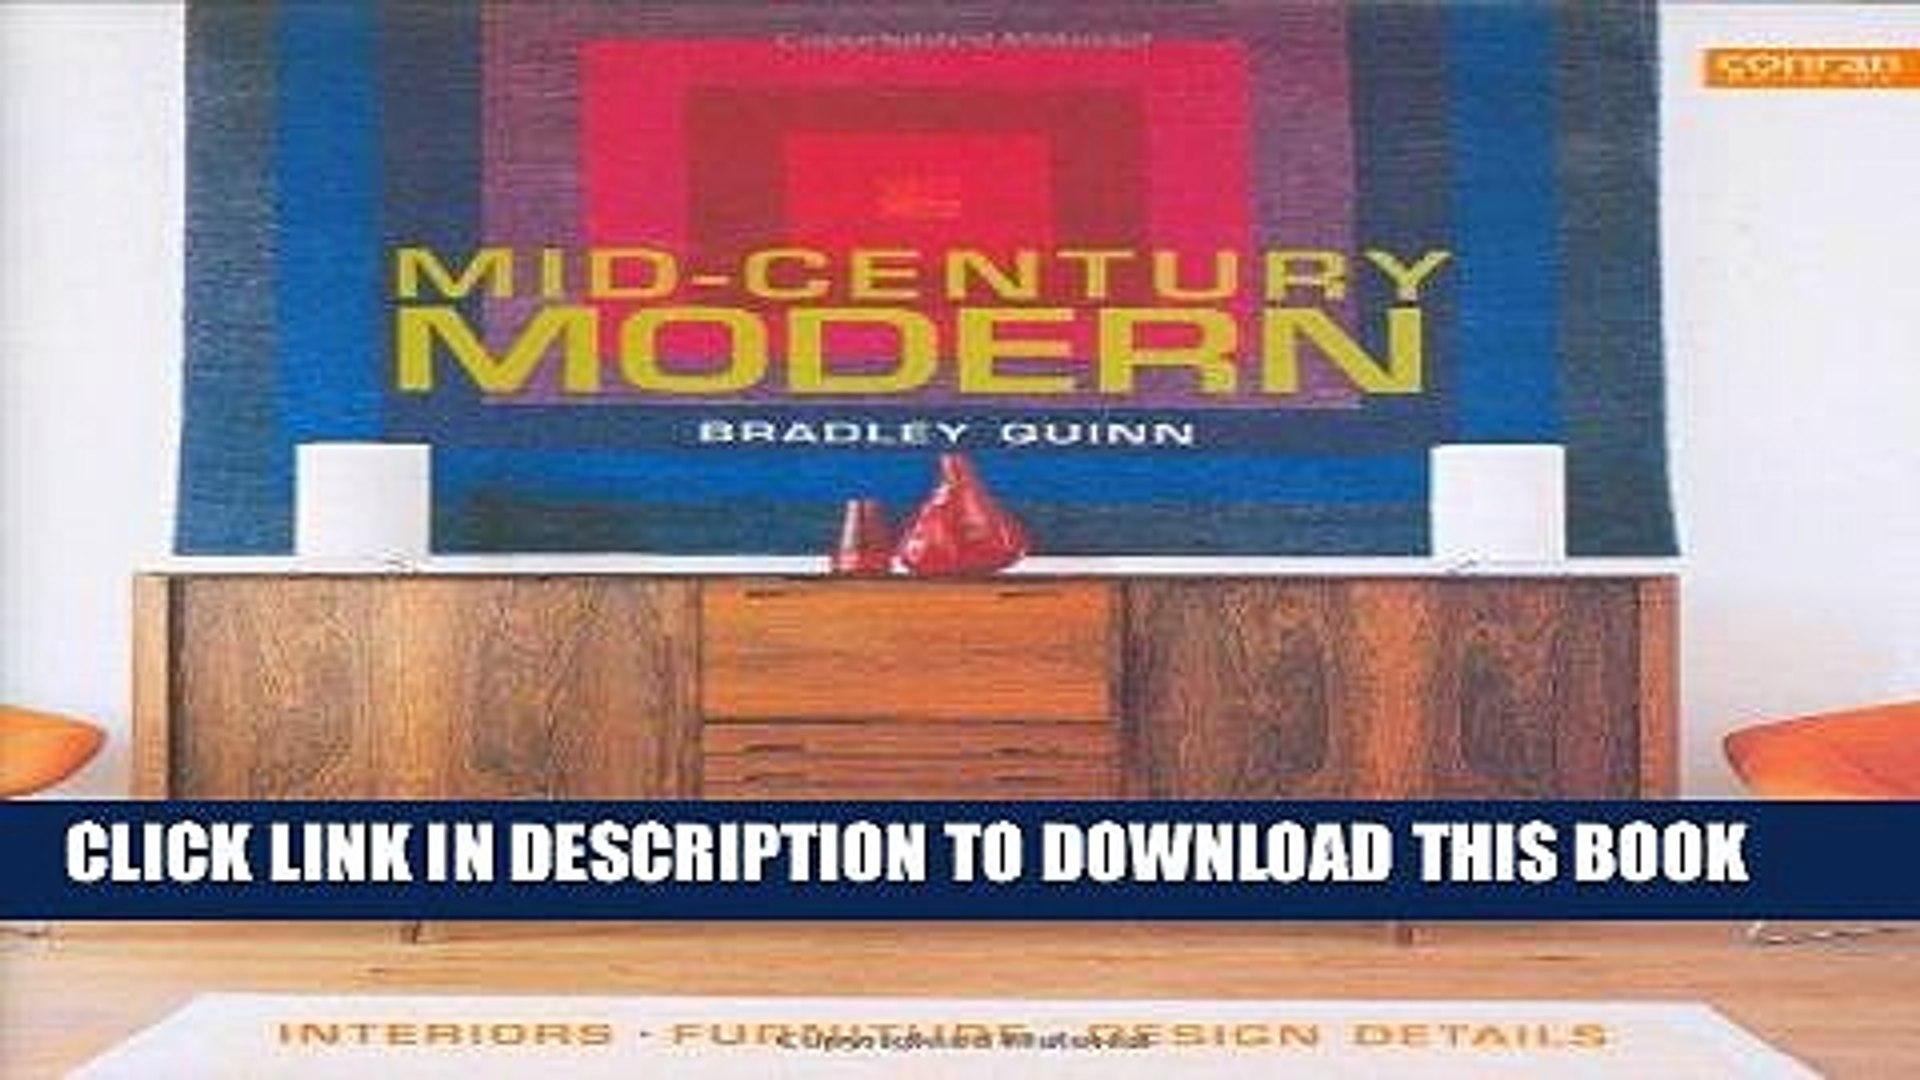 Best Seller Mid-Century Modern: Interiors, Furniture, Design Details (Conran Octopus Interiors)